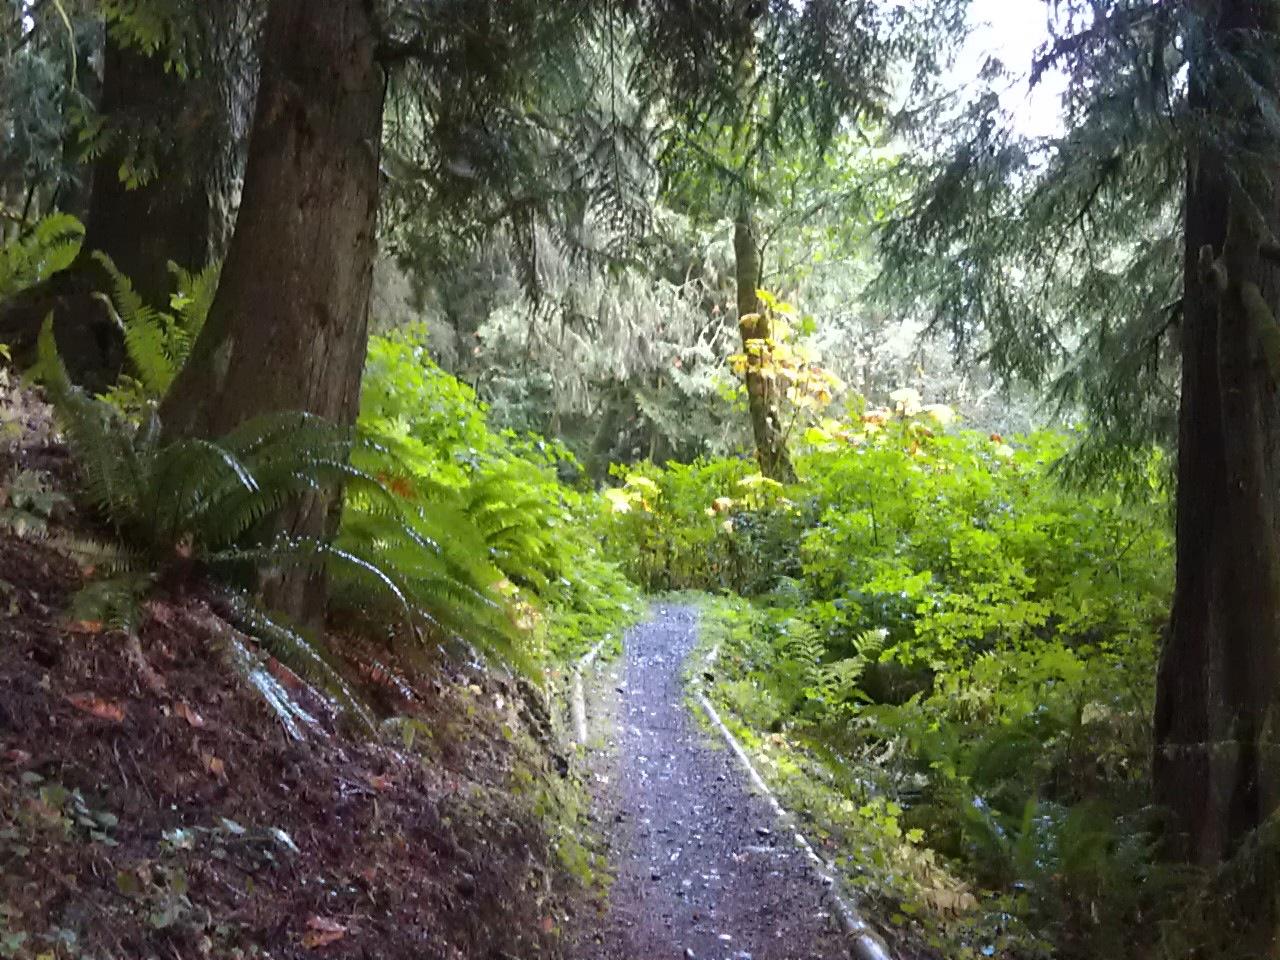 USA North-west/Olympic NP, Olympic Discovery Trail, near GraulRamapo, Walkopedia